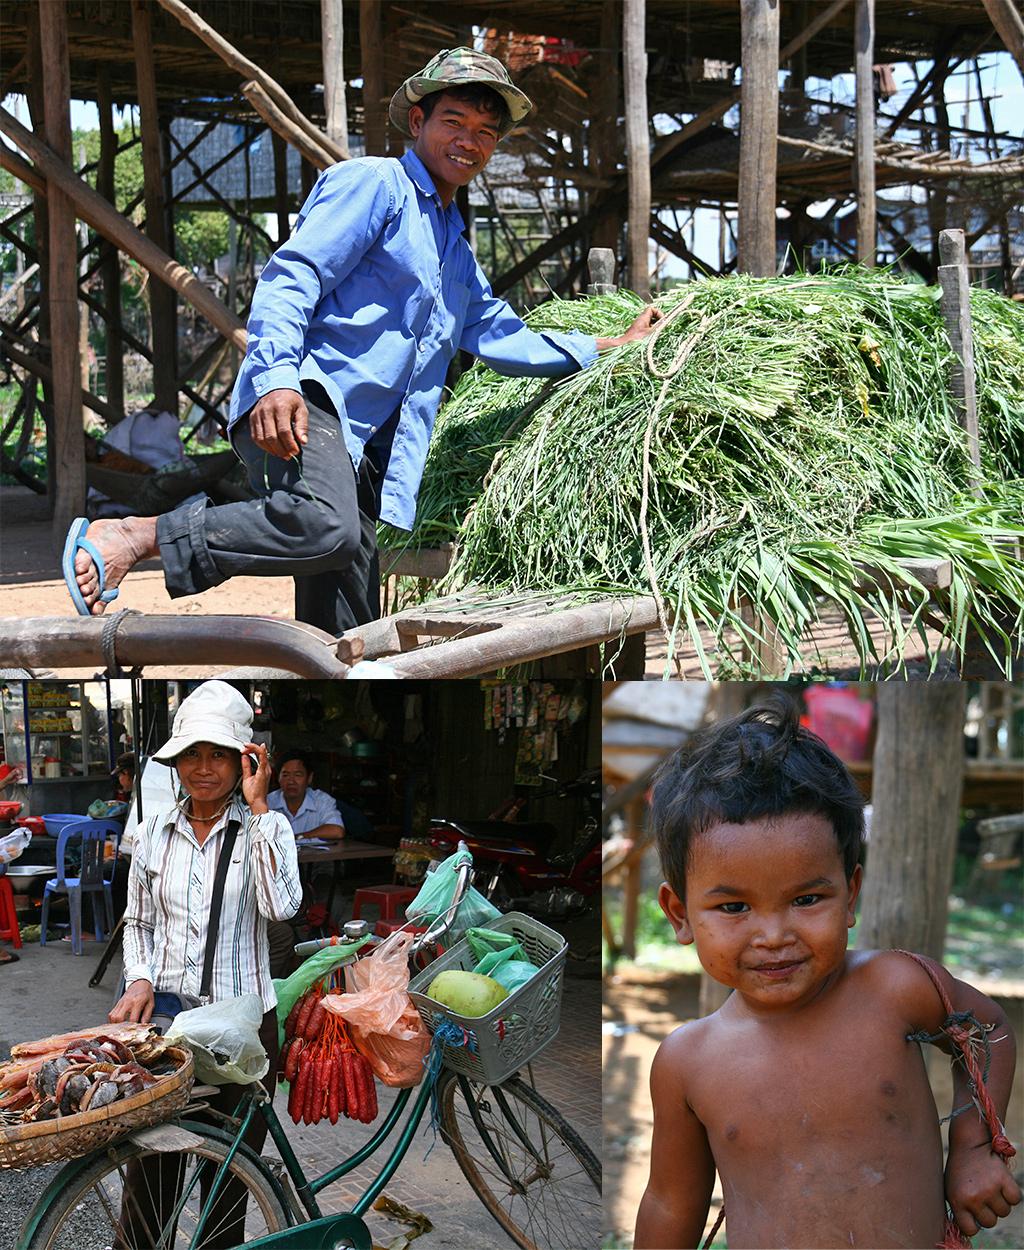 vriendelijke mensen Cambodja